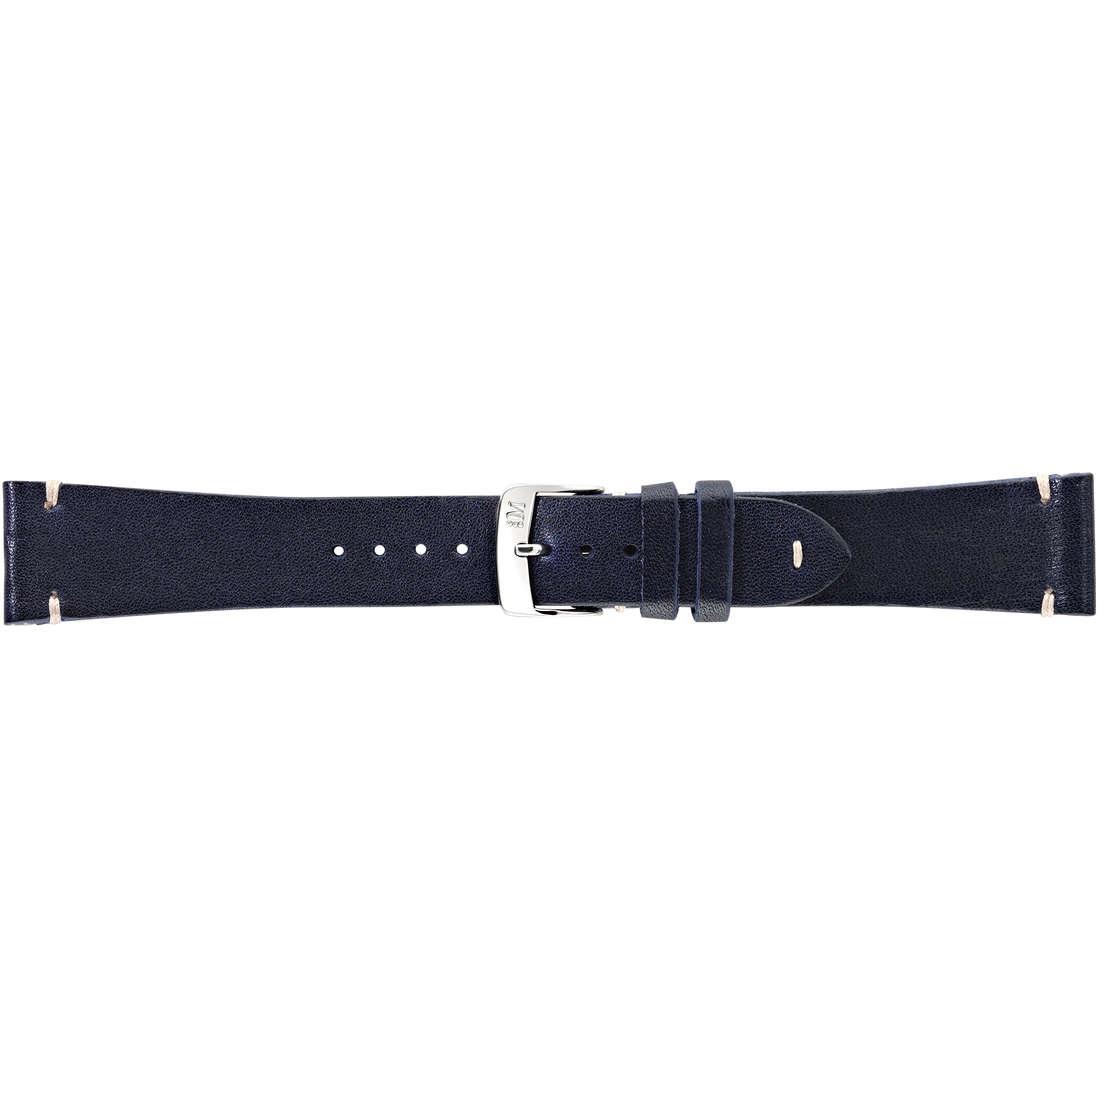 montre bande de montres homme Morellato Manufatti A01X4541A76062CR20